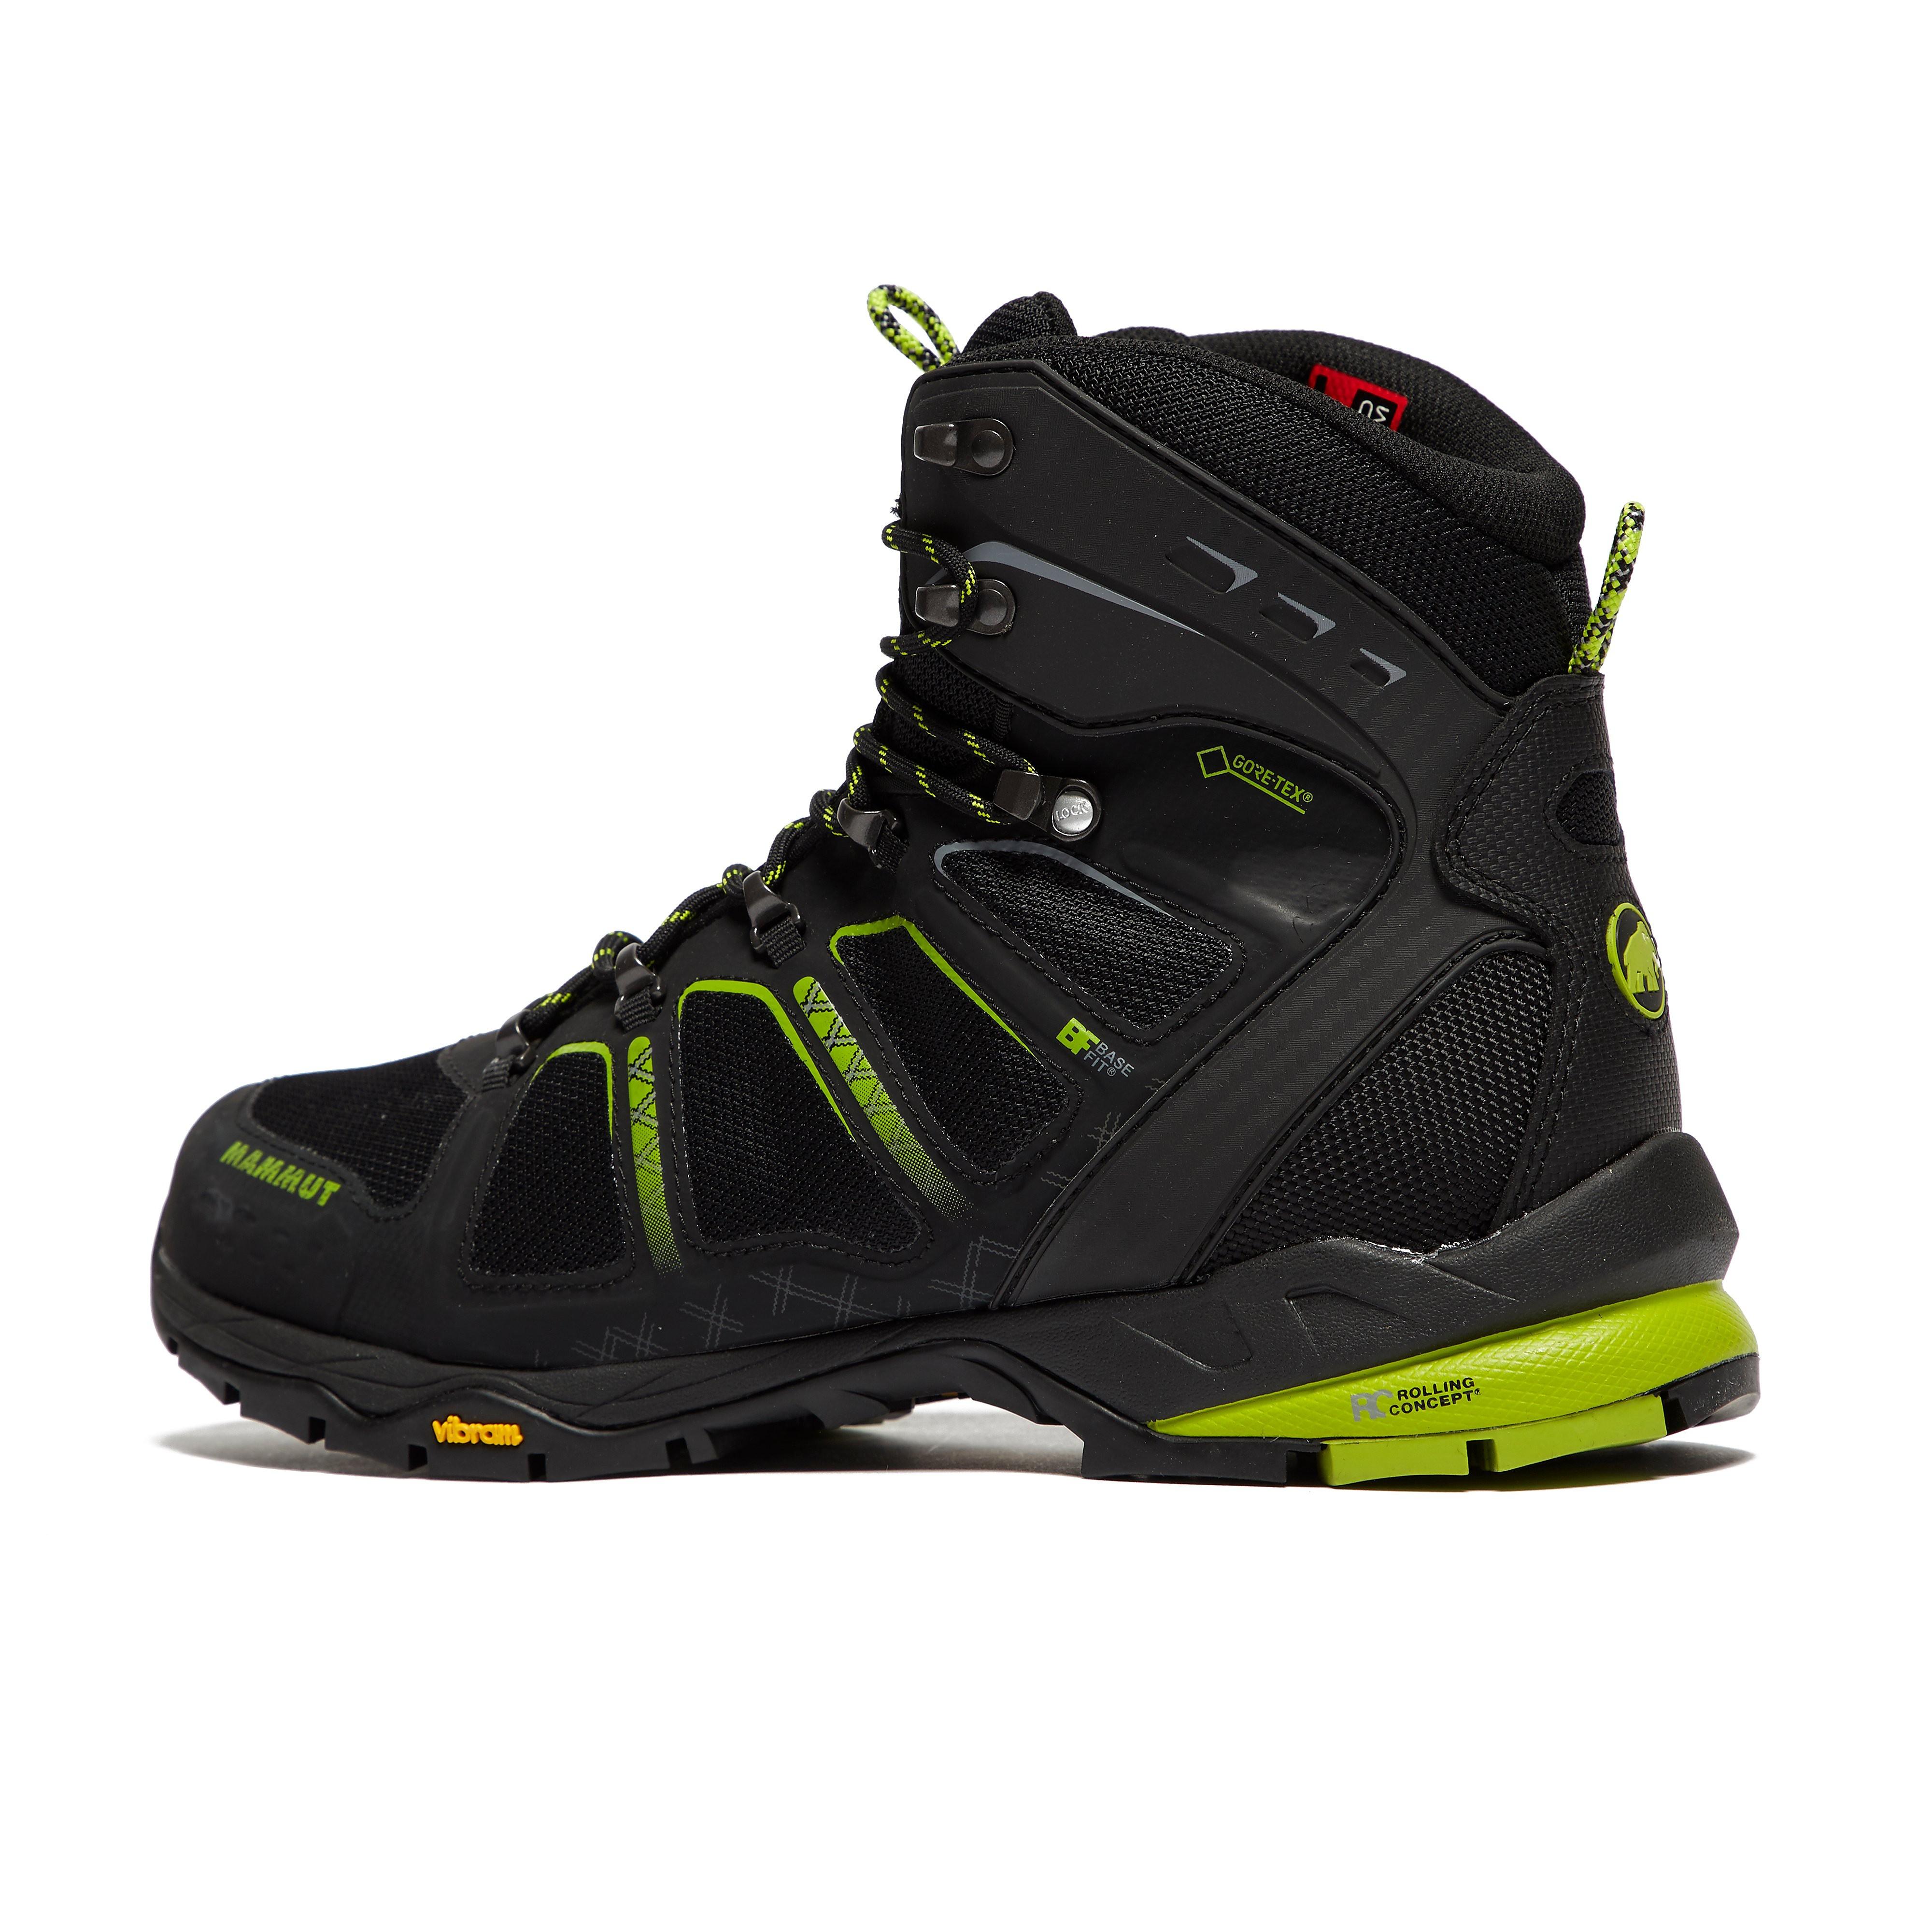 Mammut T Aenergy GTX Men's walking boots